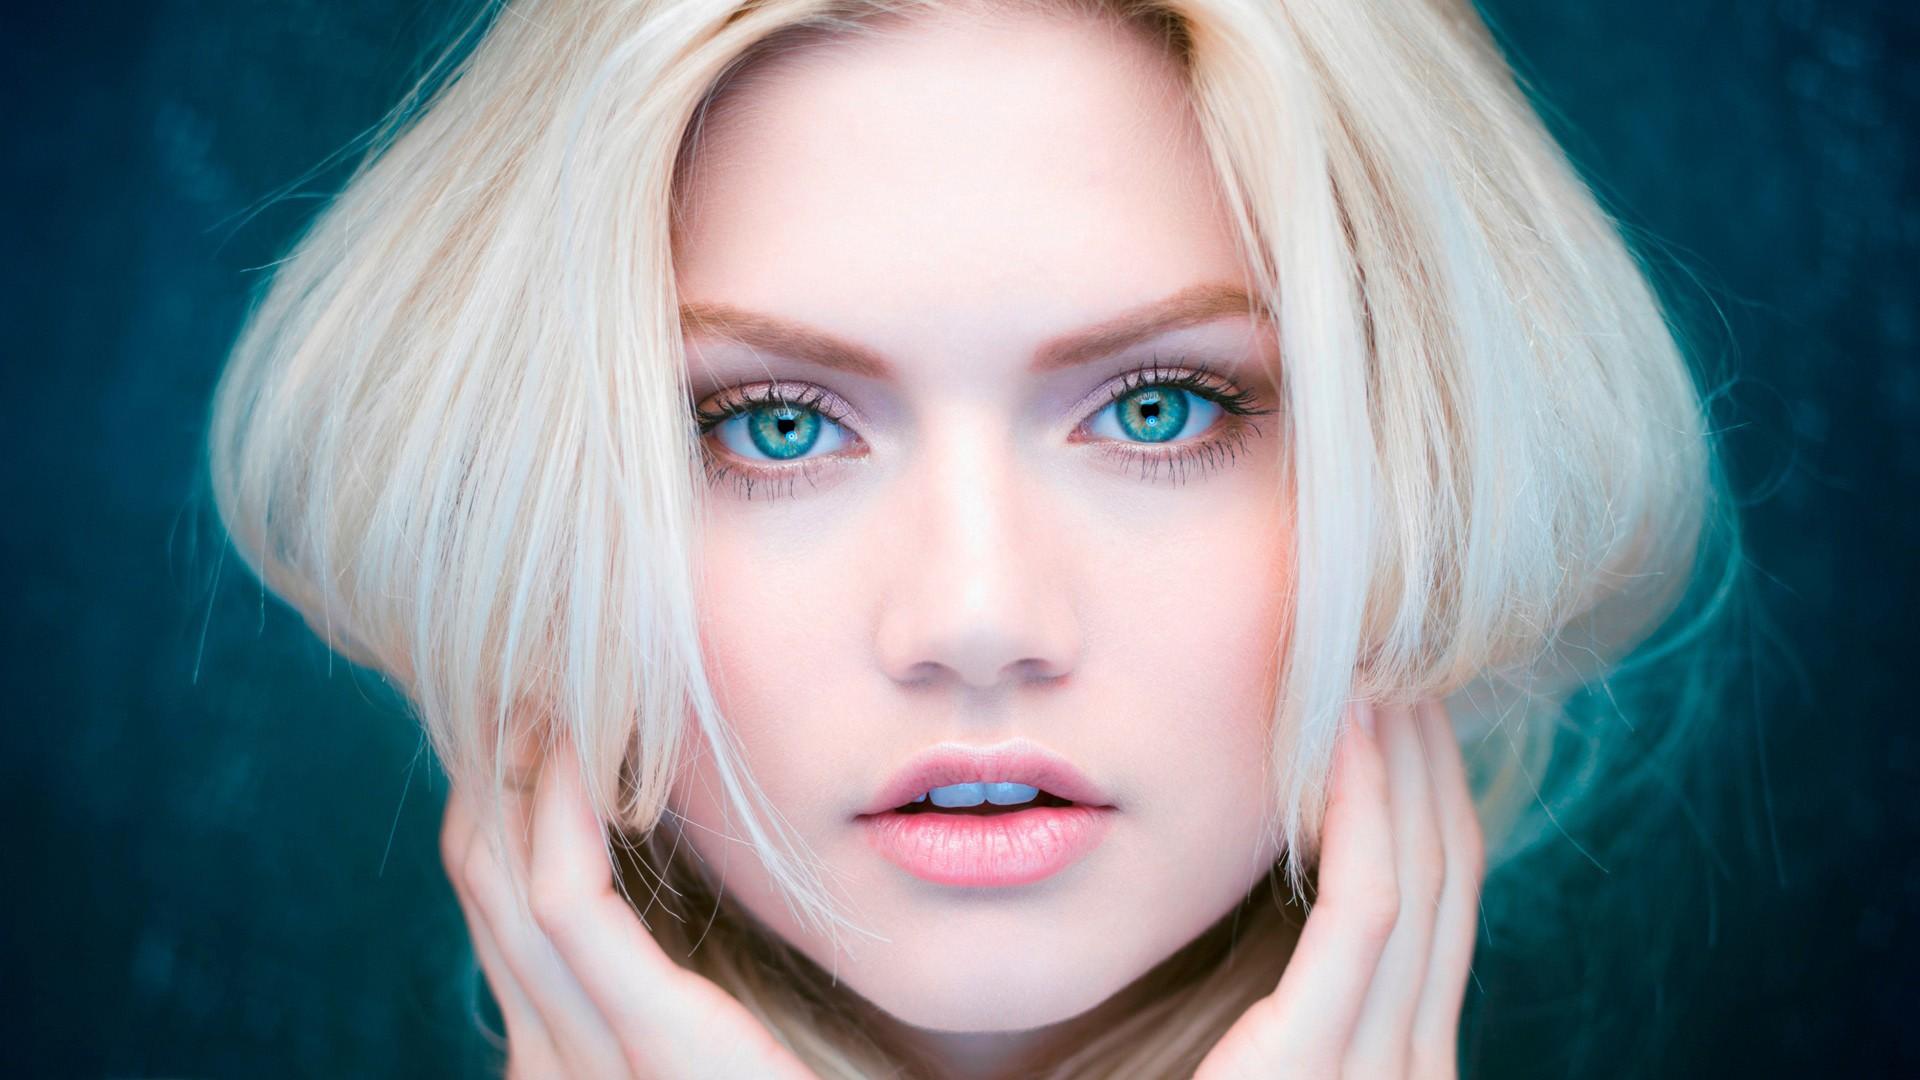 Beautiful Eyes Blonde Girl Hd Girls 4k Wallpapers